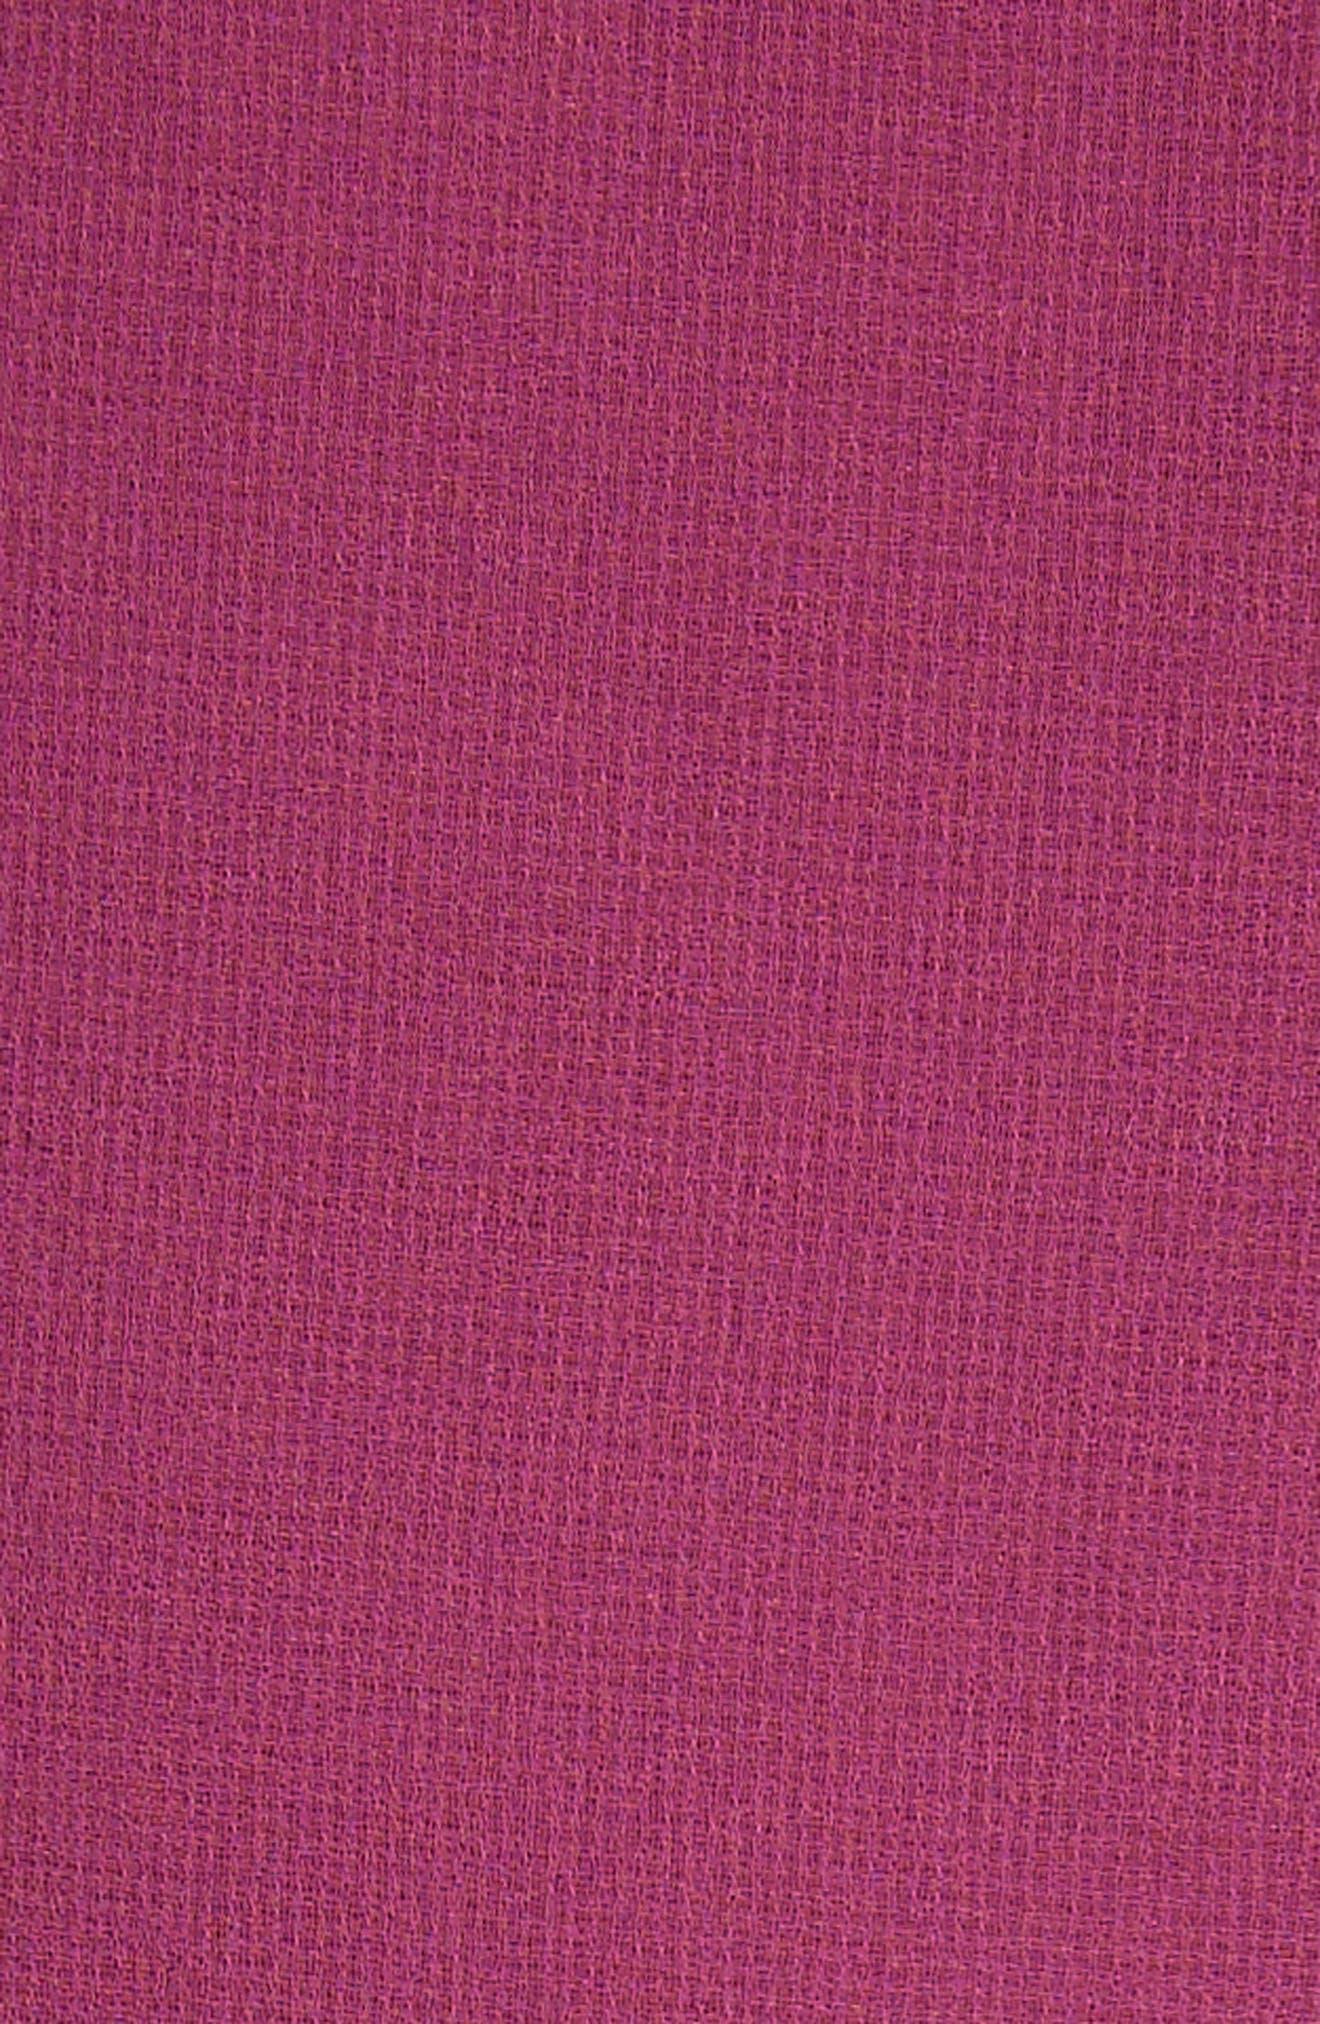 Dena Ruffle Top,                             Alternate thumbnail 5, color,                             645